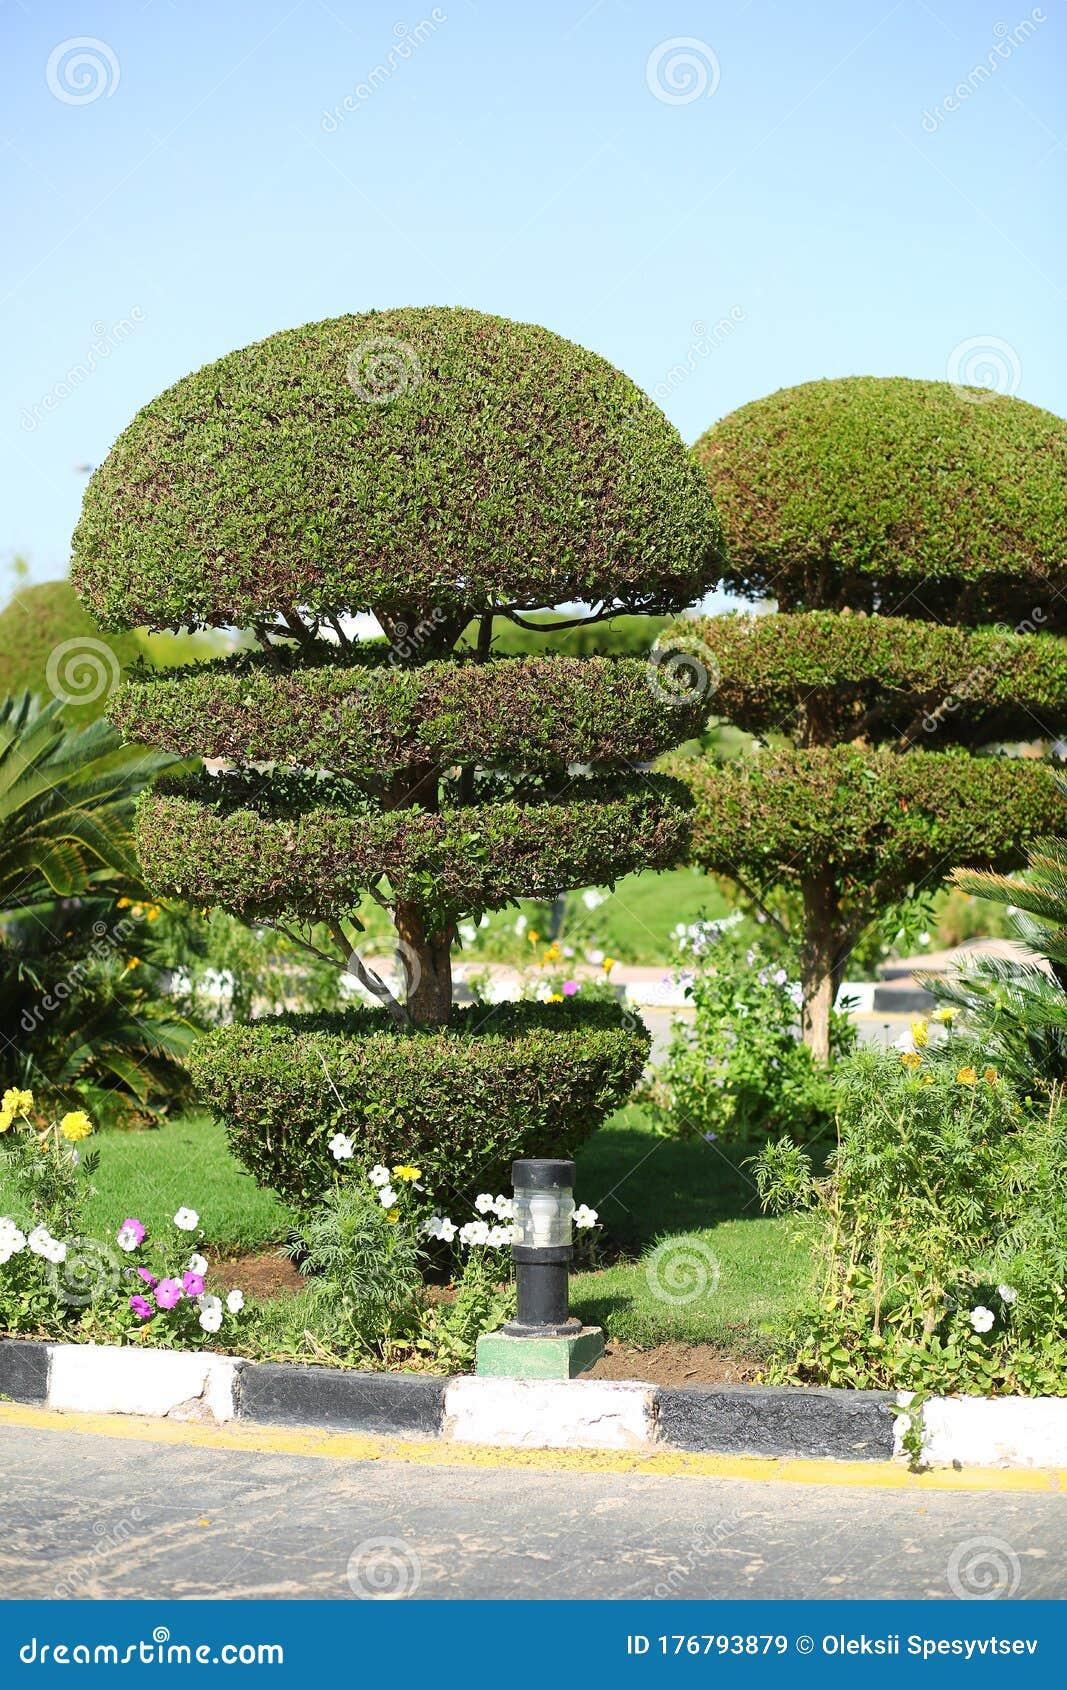 Creative Art Shape Topiary Tree Gardening Landscape Design Stock Image Image Of Sphere Garden 176793879